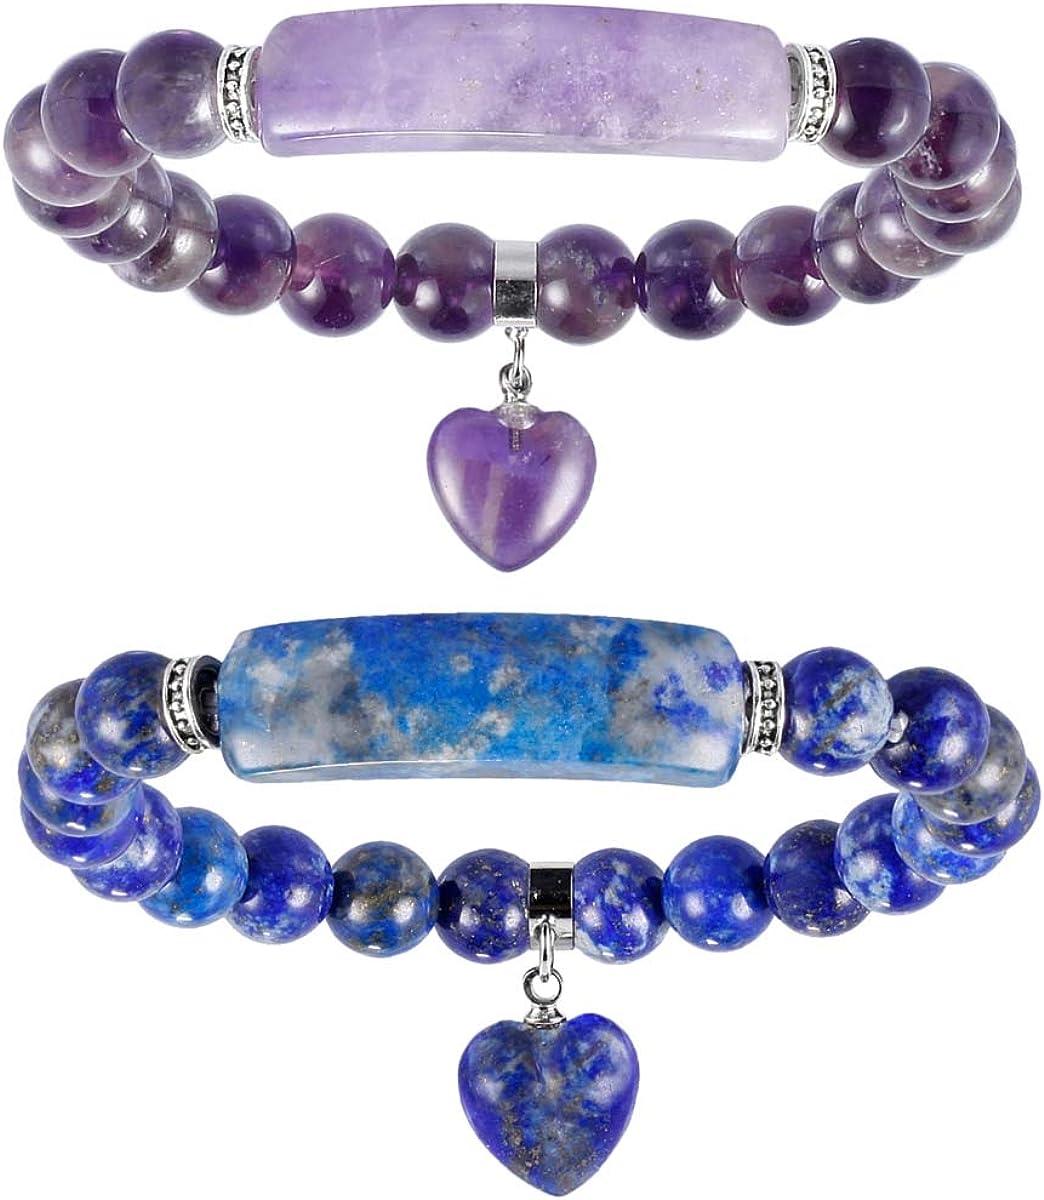 8MM Healing Stone Bracelets,Amethyst Natural Gemstone Charm Stretch Bracelet,Aventurine Jade Stretch Bracelet,Beads Chakra Crystal Energy Heart Charm Bracelet,Handmade Jewelry for Women